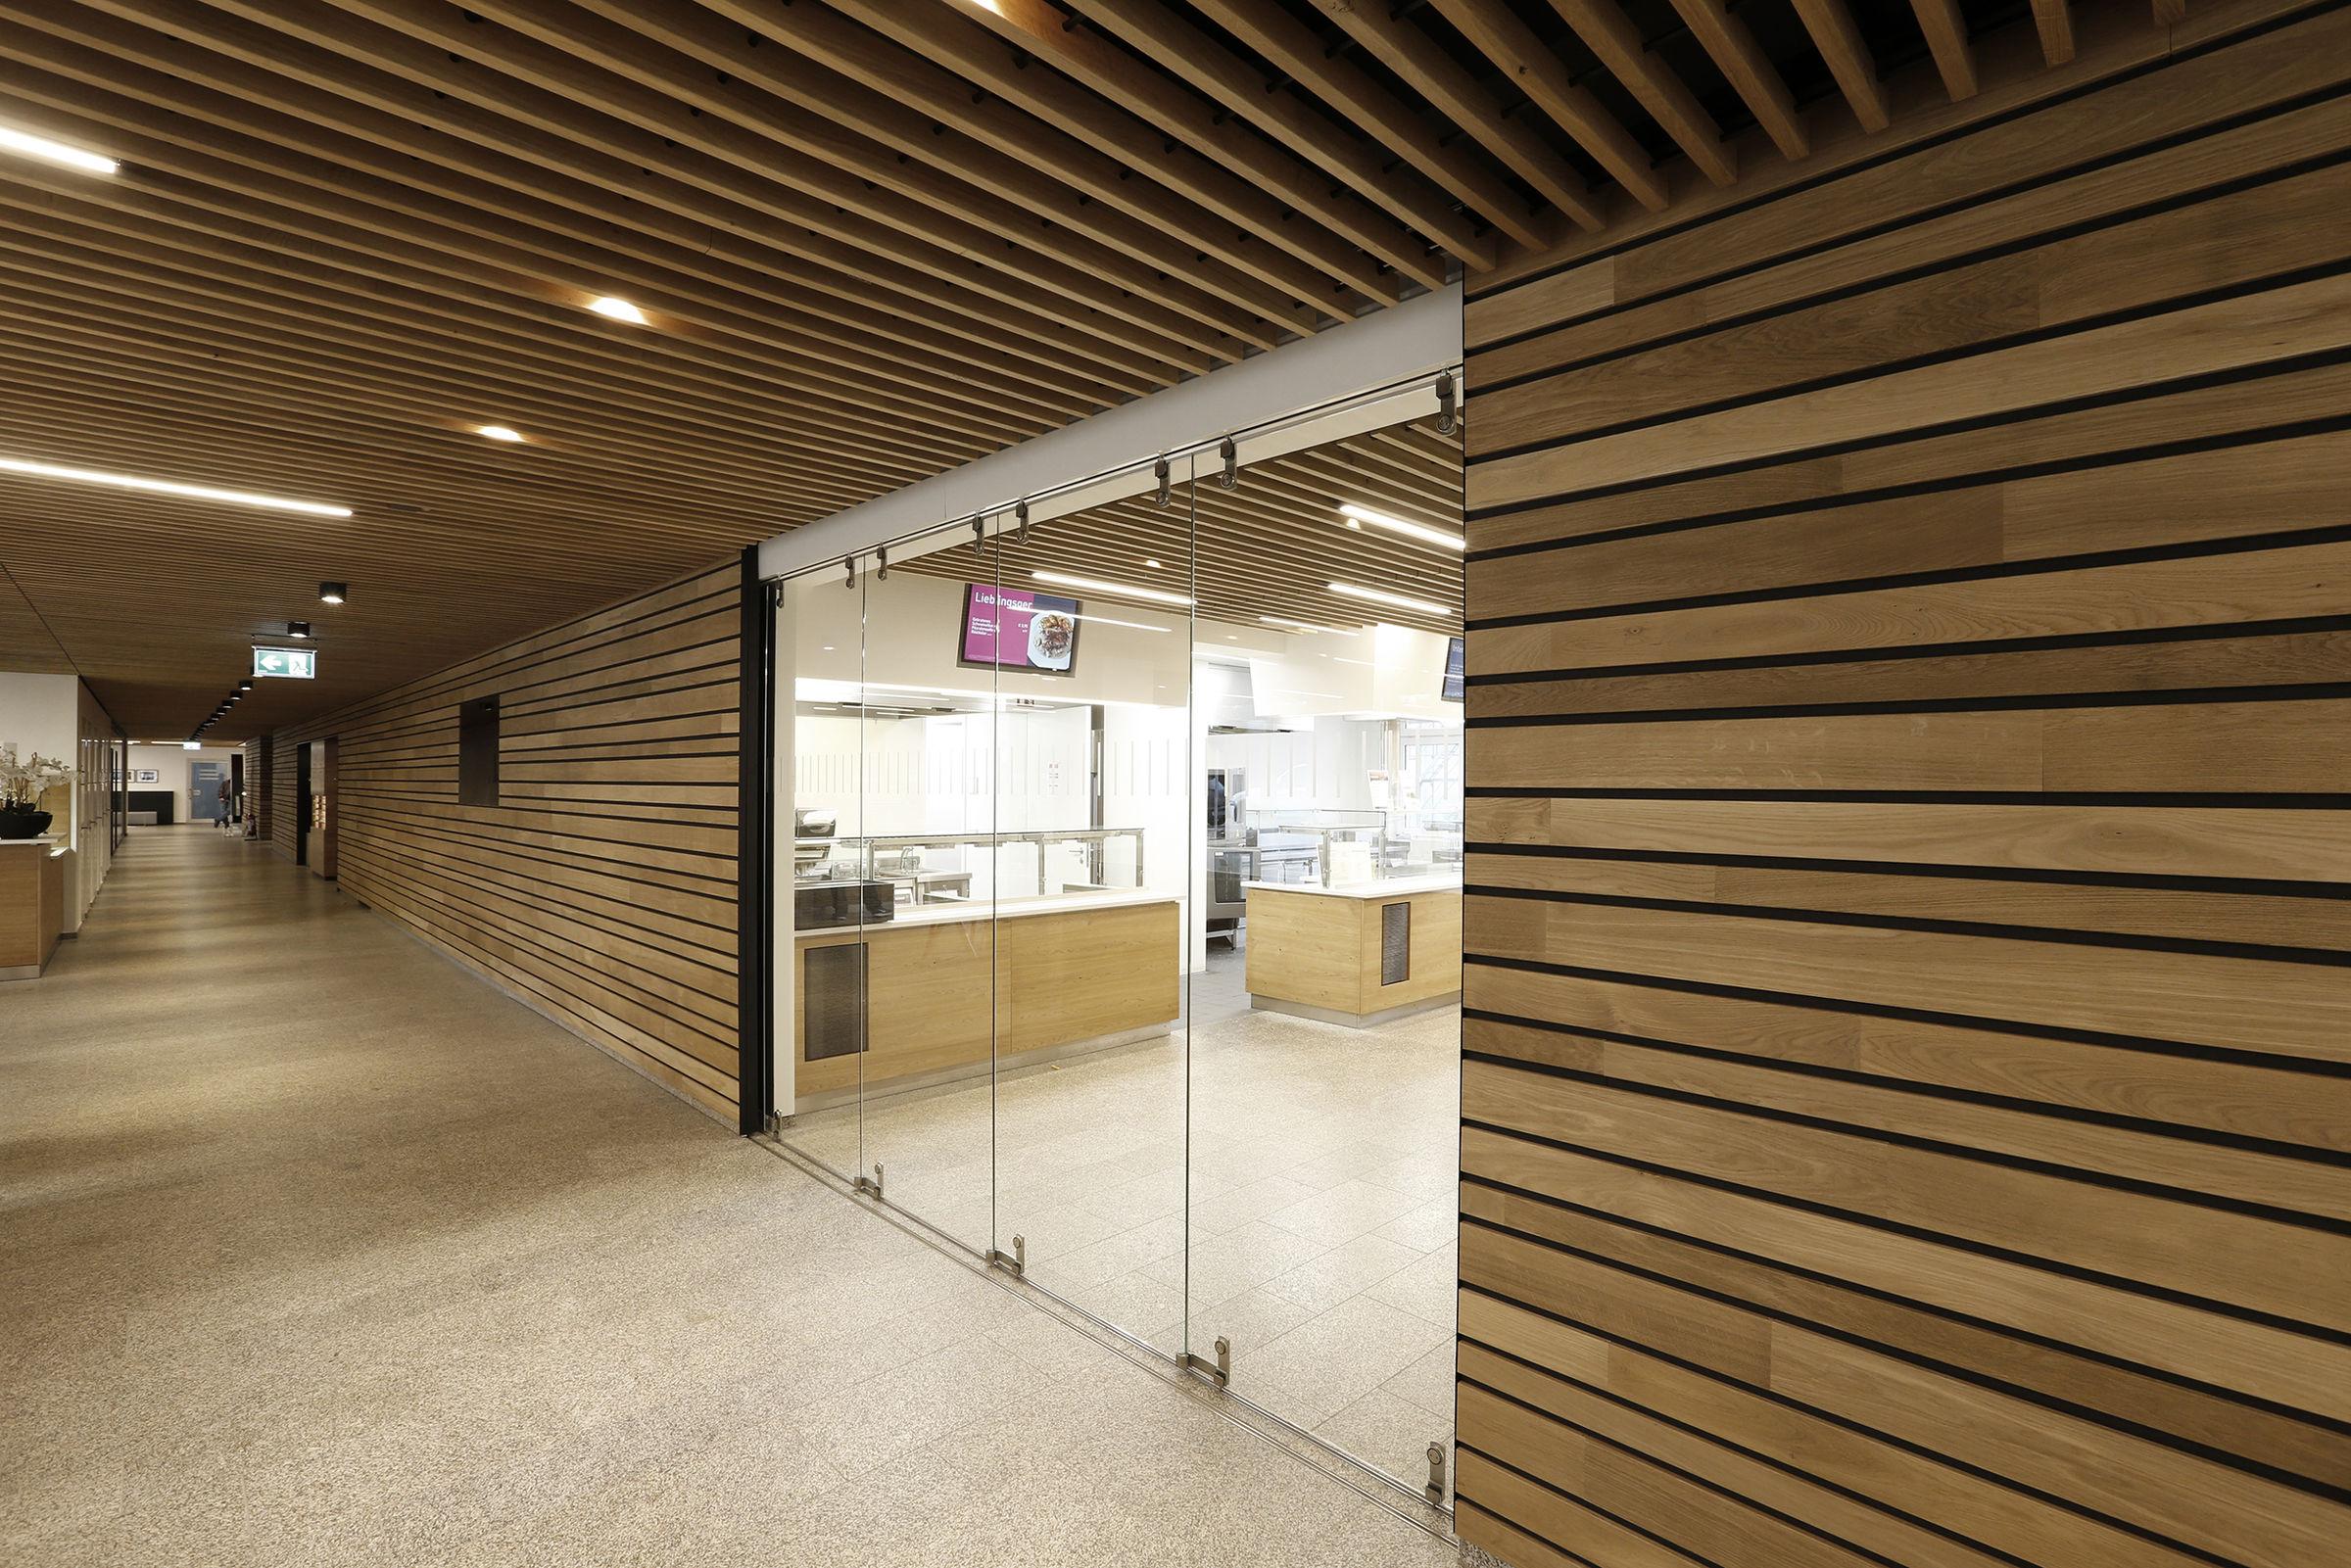 Linear - Wood Walls Interior